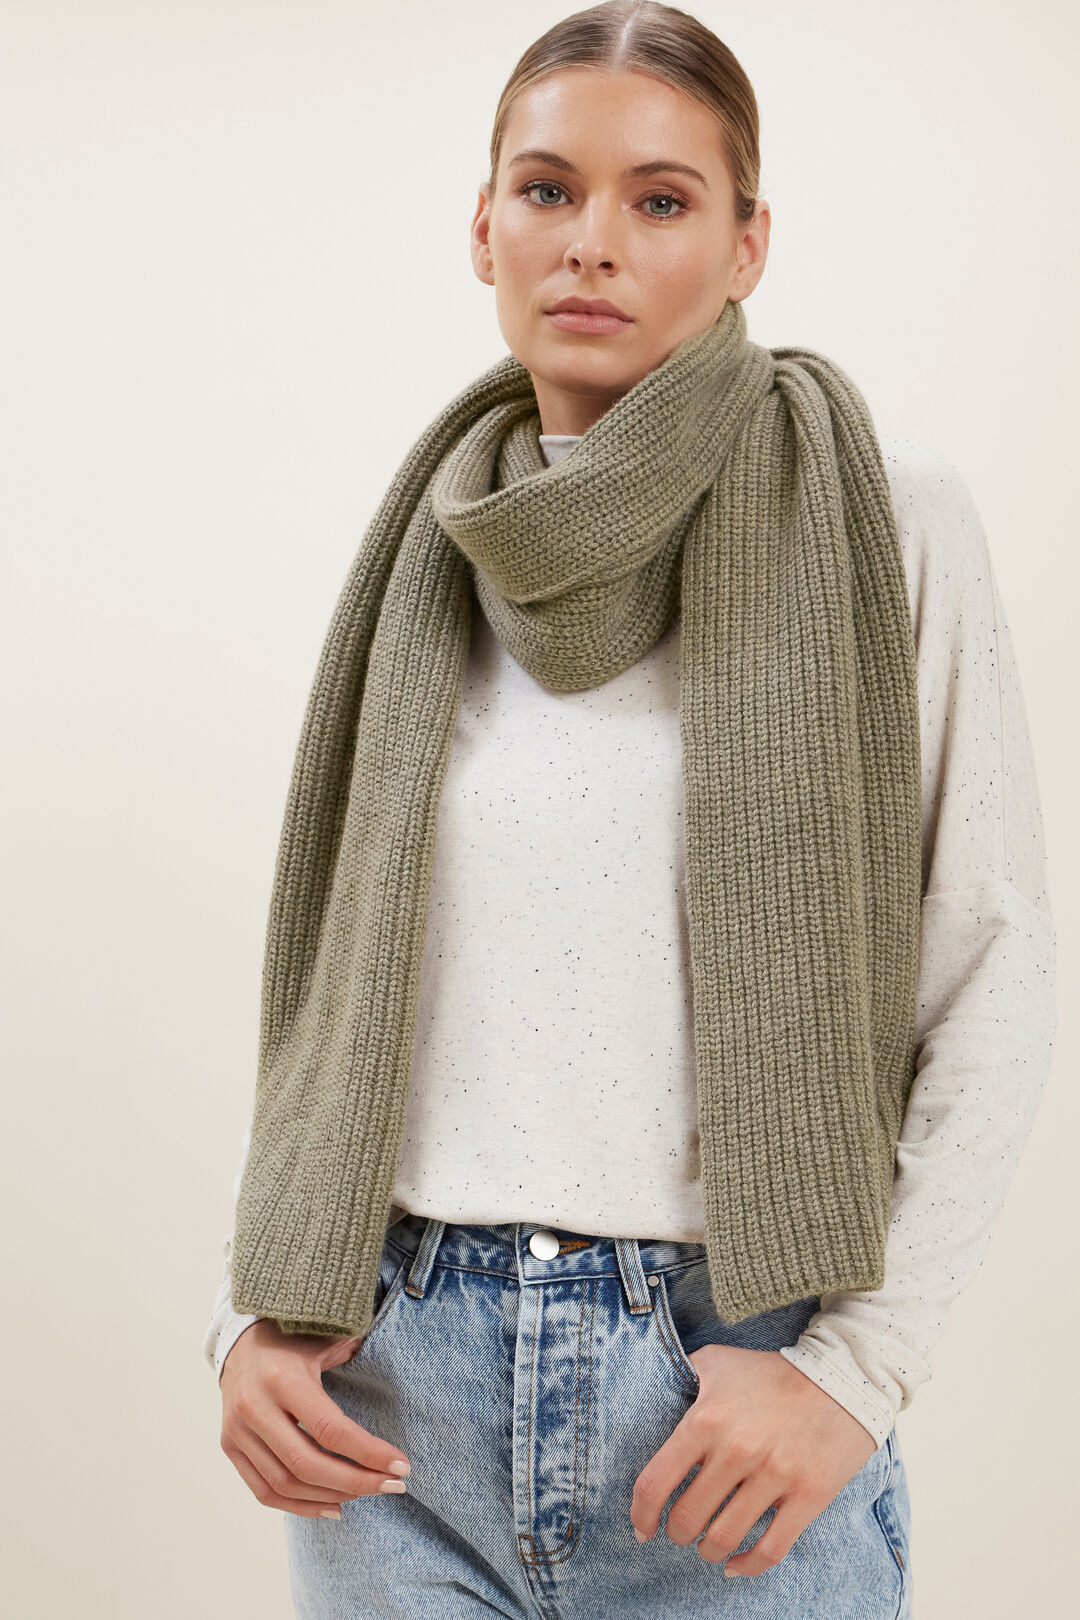 Wool Rib Scarf  OLIVE KHAKI MARLE  hi-res